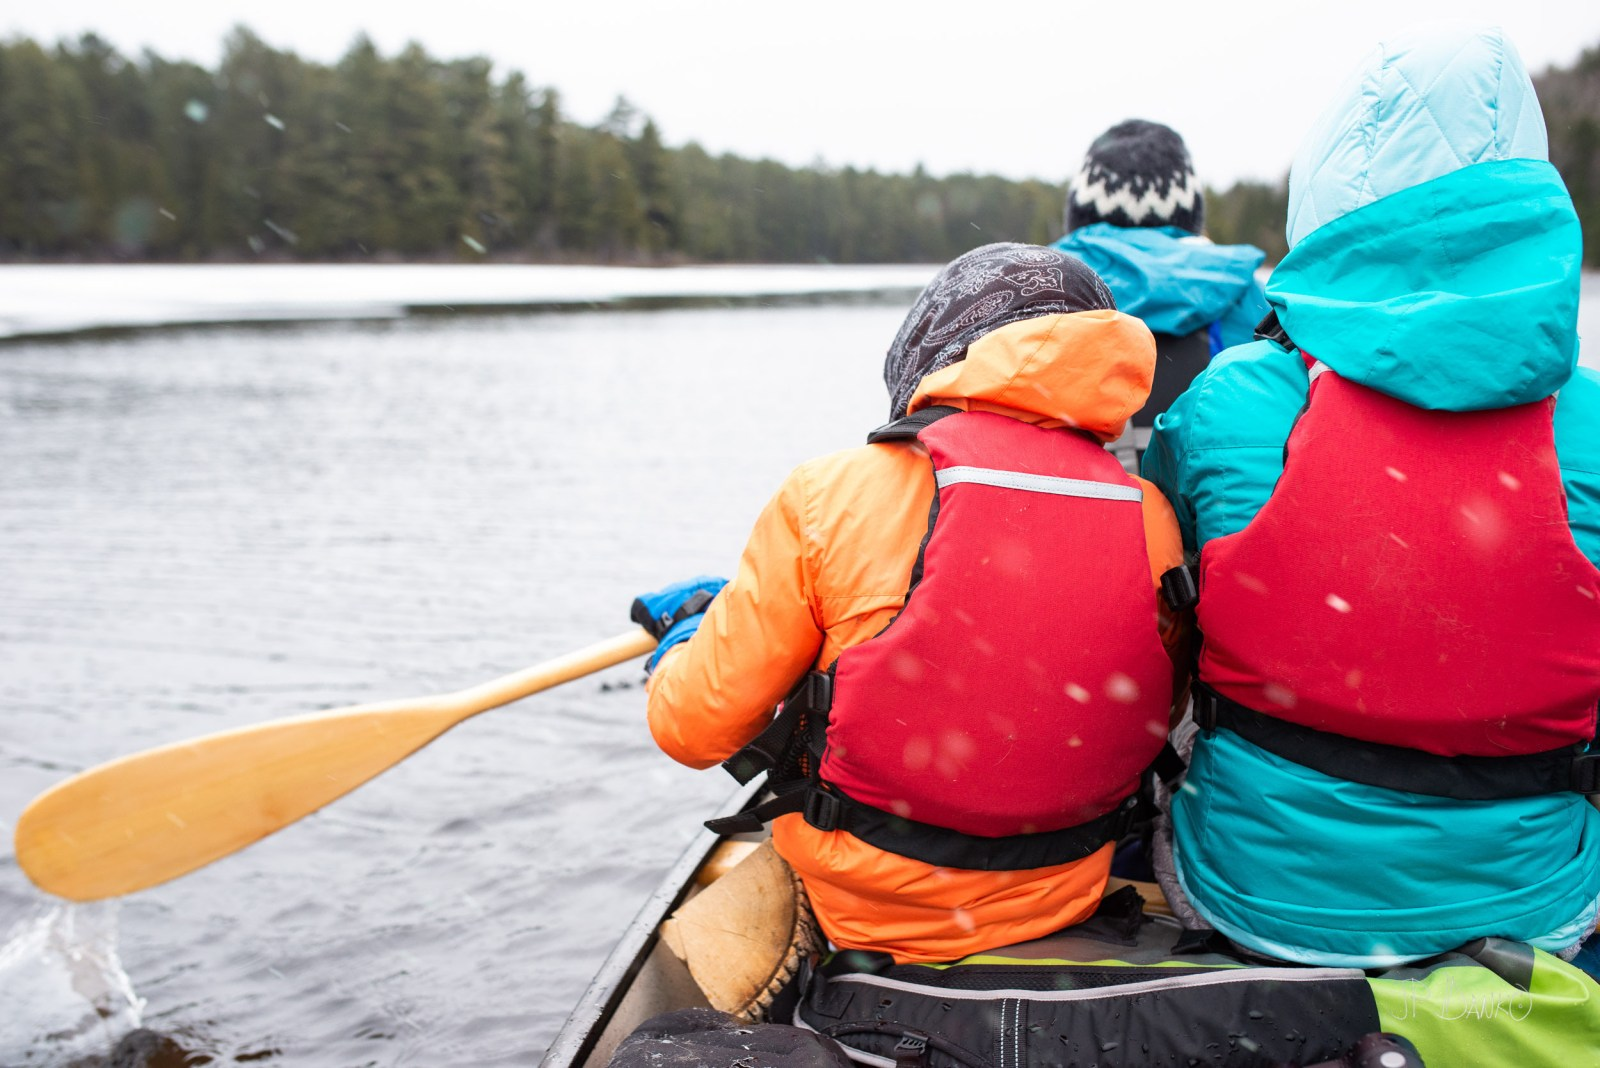 Family Paddling Spring Red Canoe Trip Backcountry Wilderness Blo